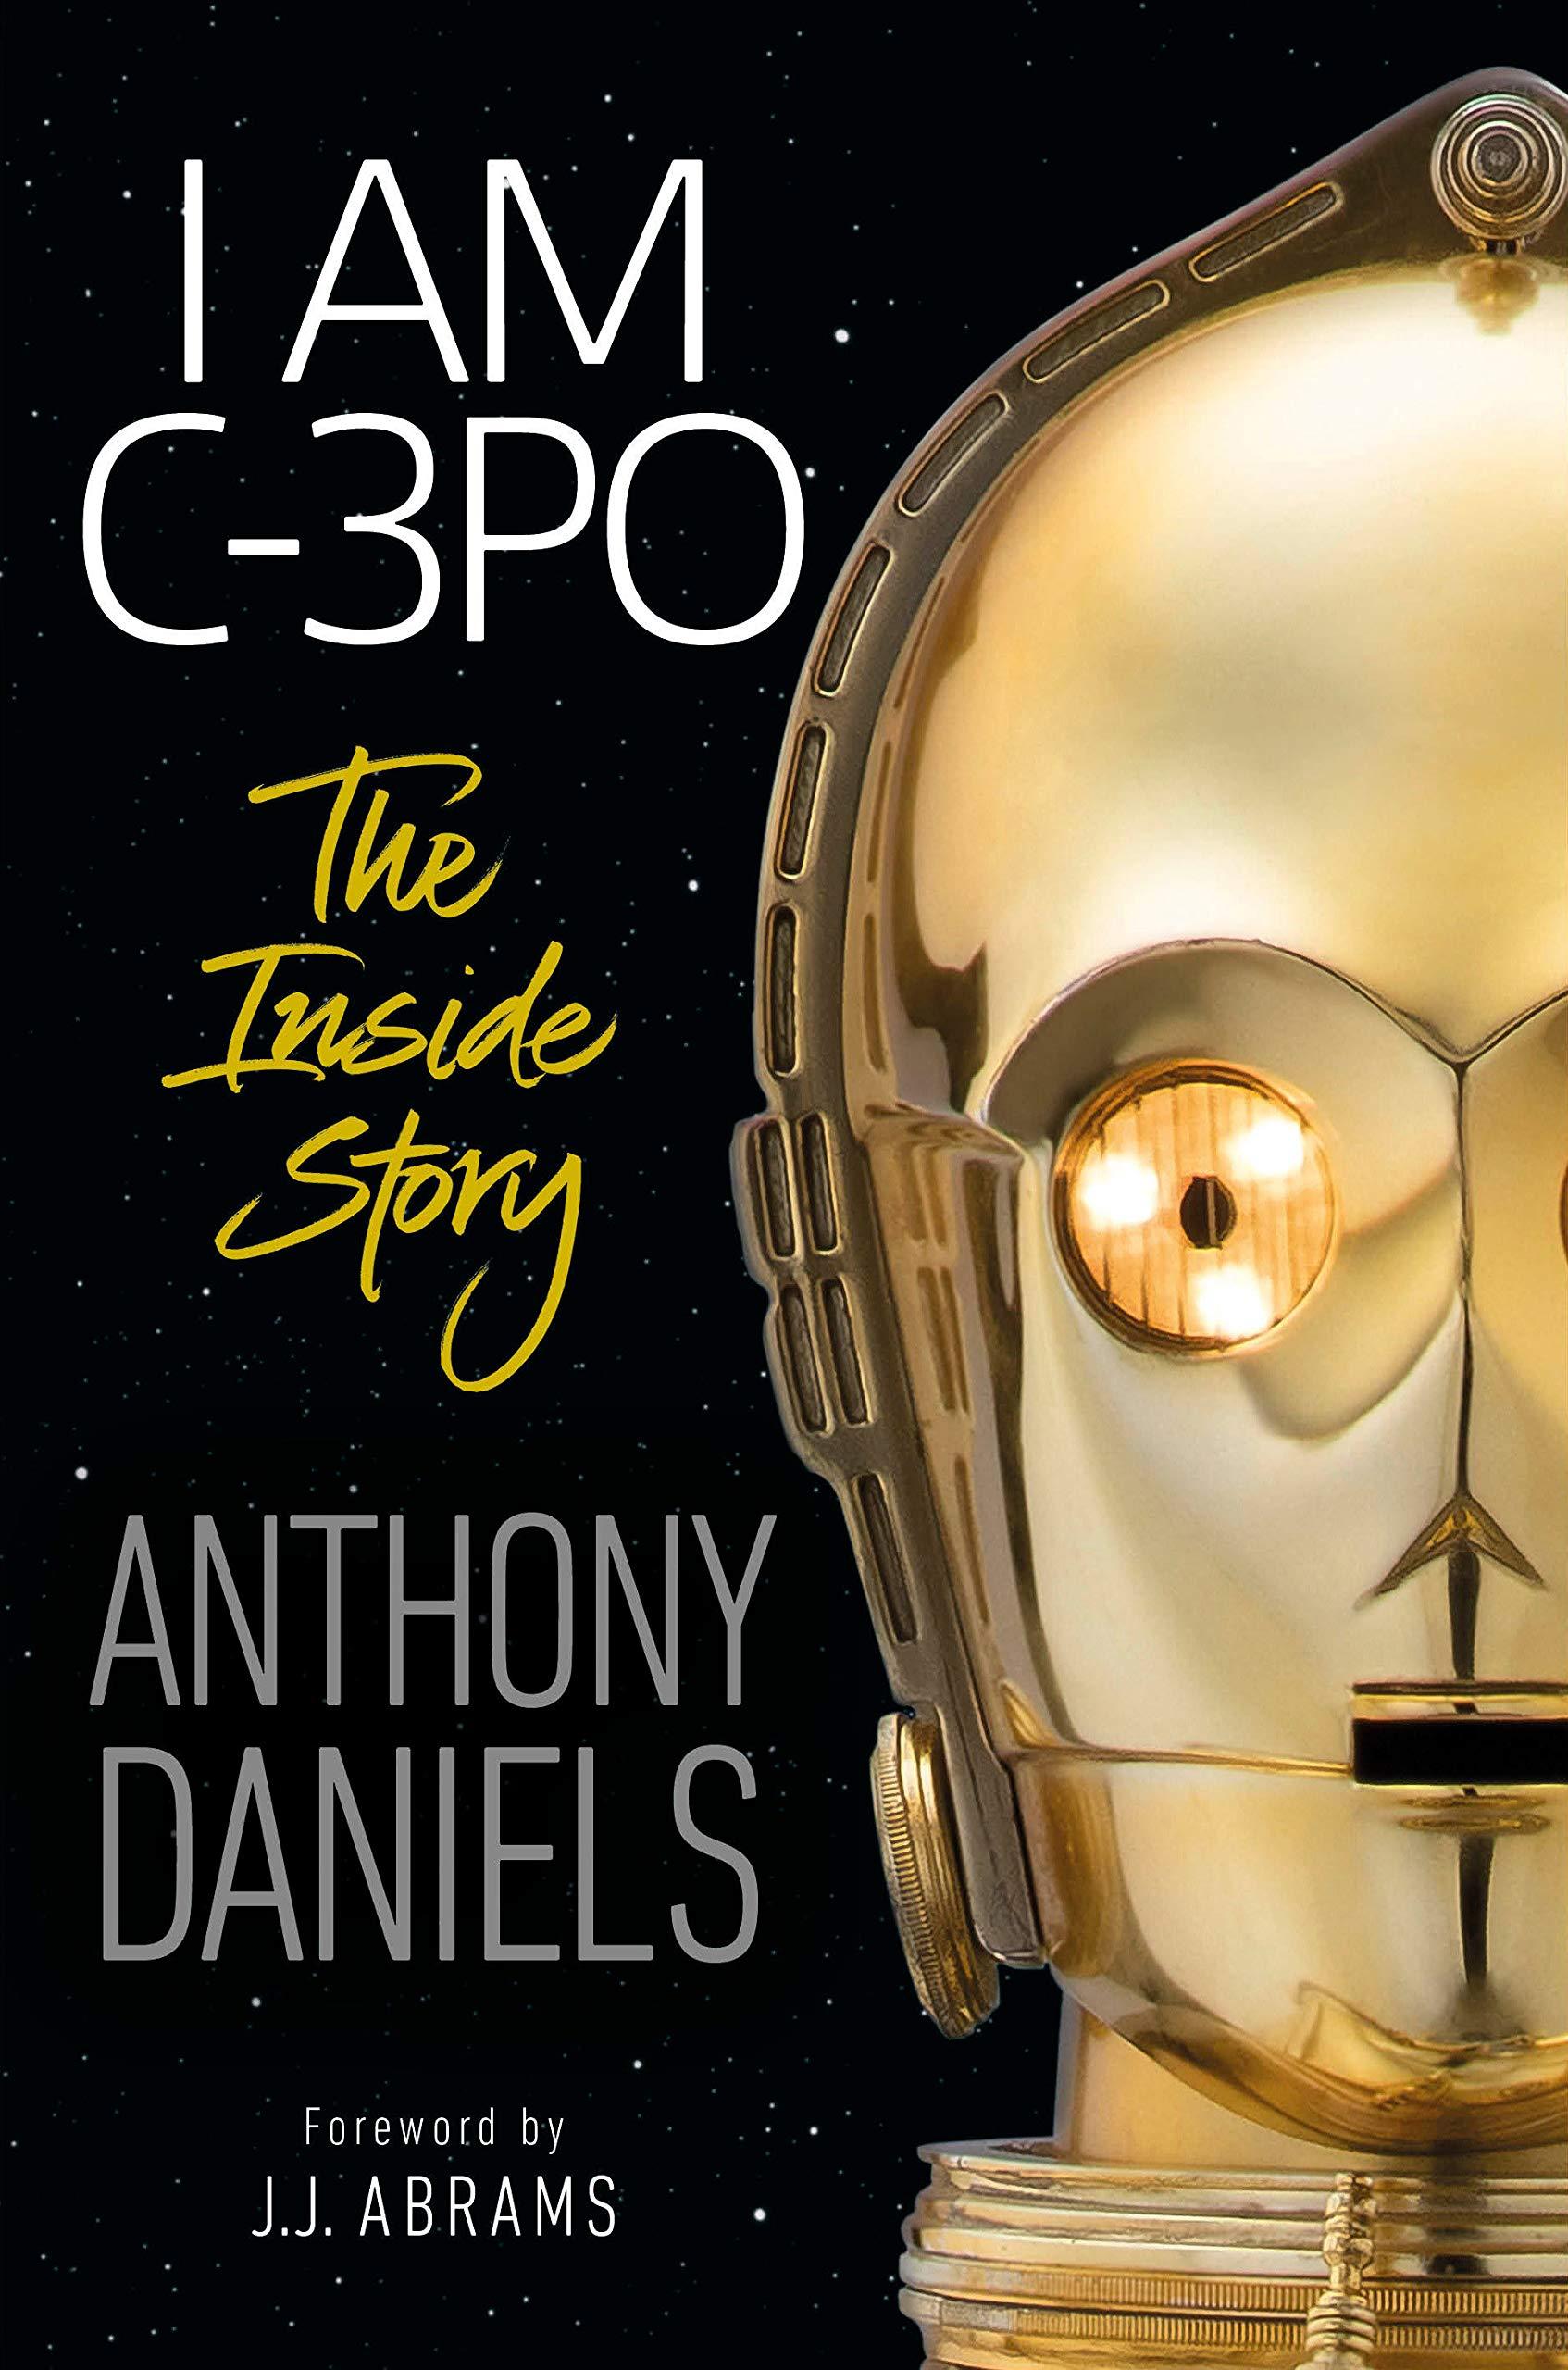 I Am C-3PO: The Inside Story: Foreword by J.J. Abrams: Daniels, Anthony, Abrams, J.J.: 9781465486103: Amazon.com: Books